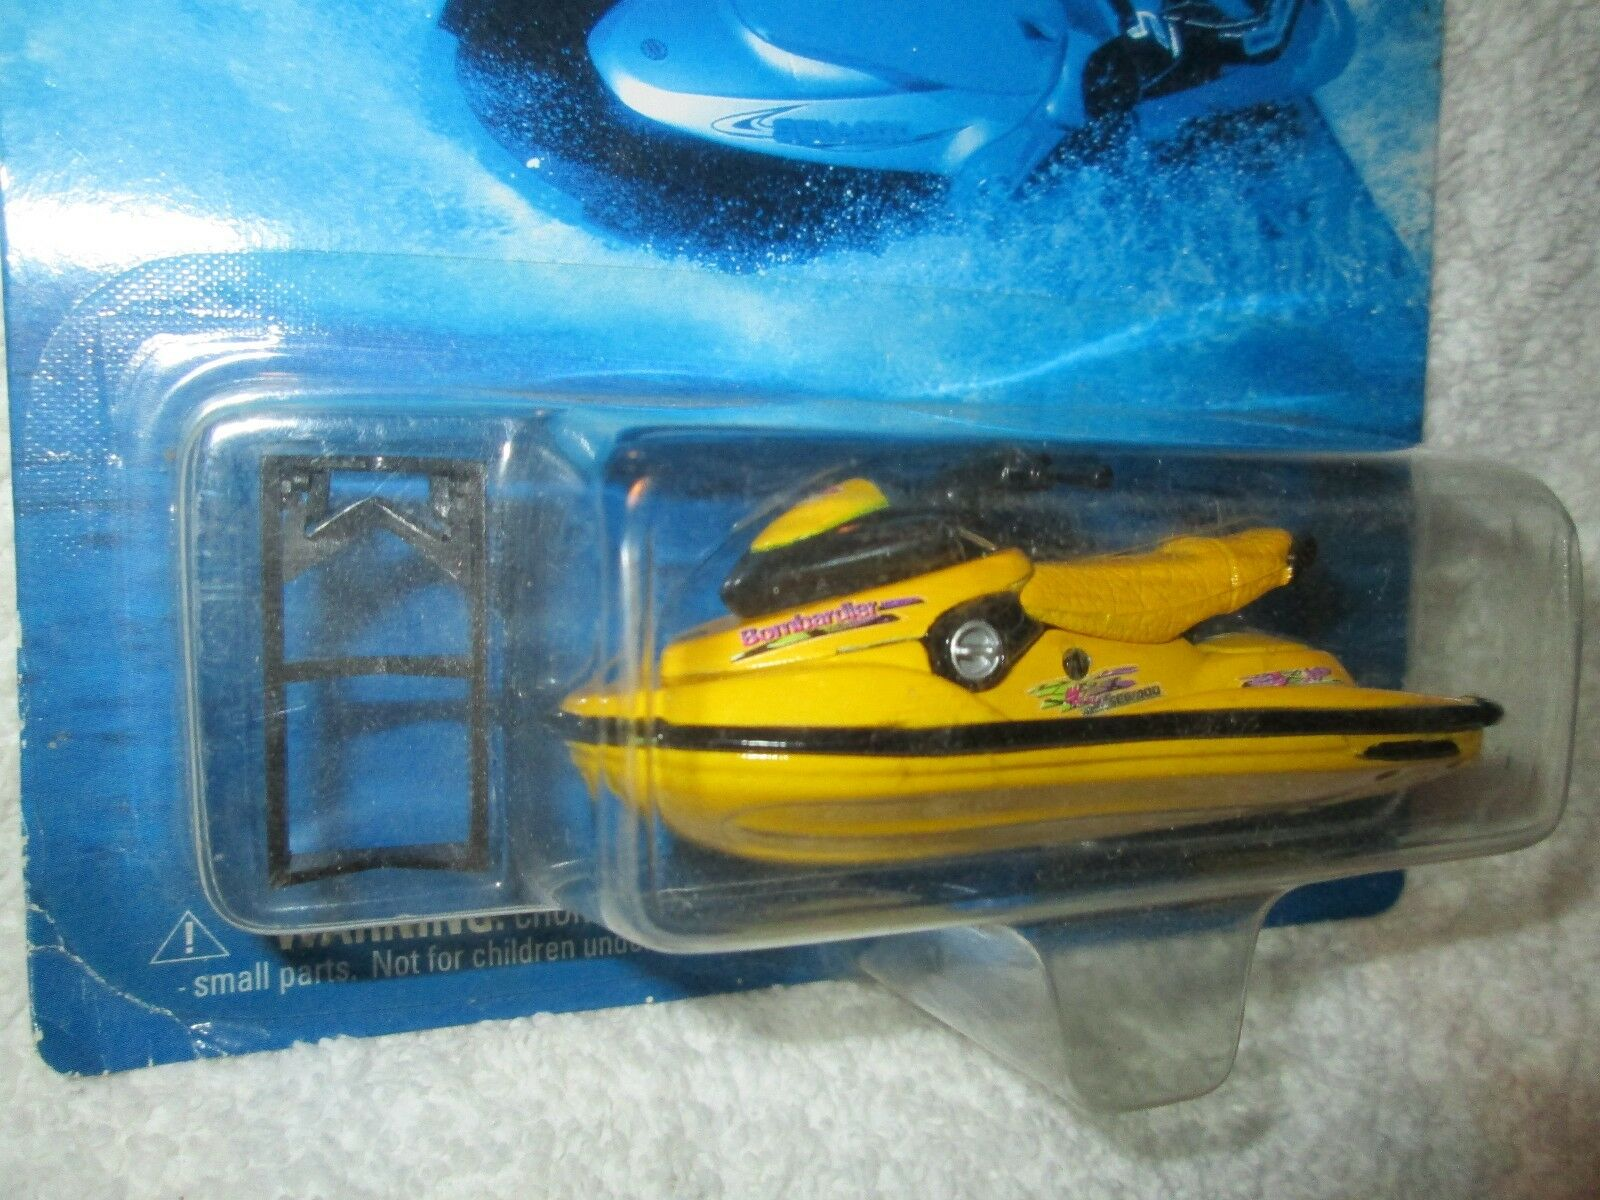 Sea Doo Doo Doo Johnny Lightning Watercraft 1997 Model XP Limitado Sicktrix Jetski 64b96e